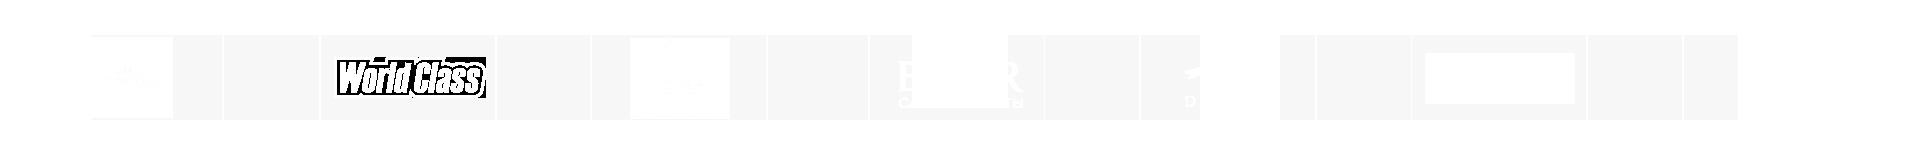 logos salony - Отзывы о технологии HydraFacial®